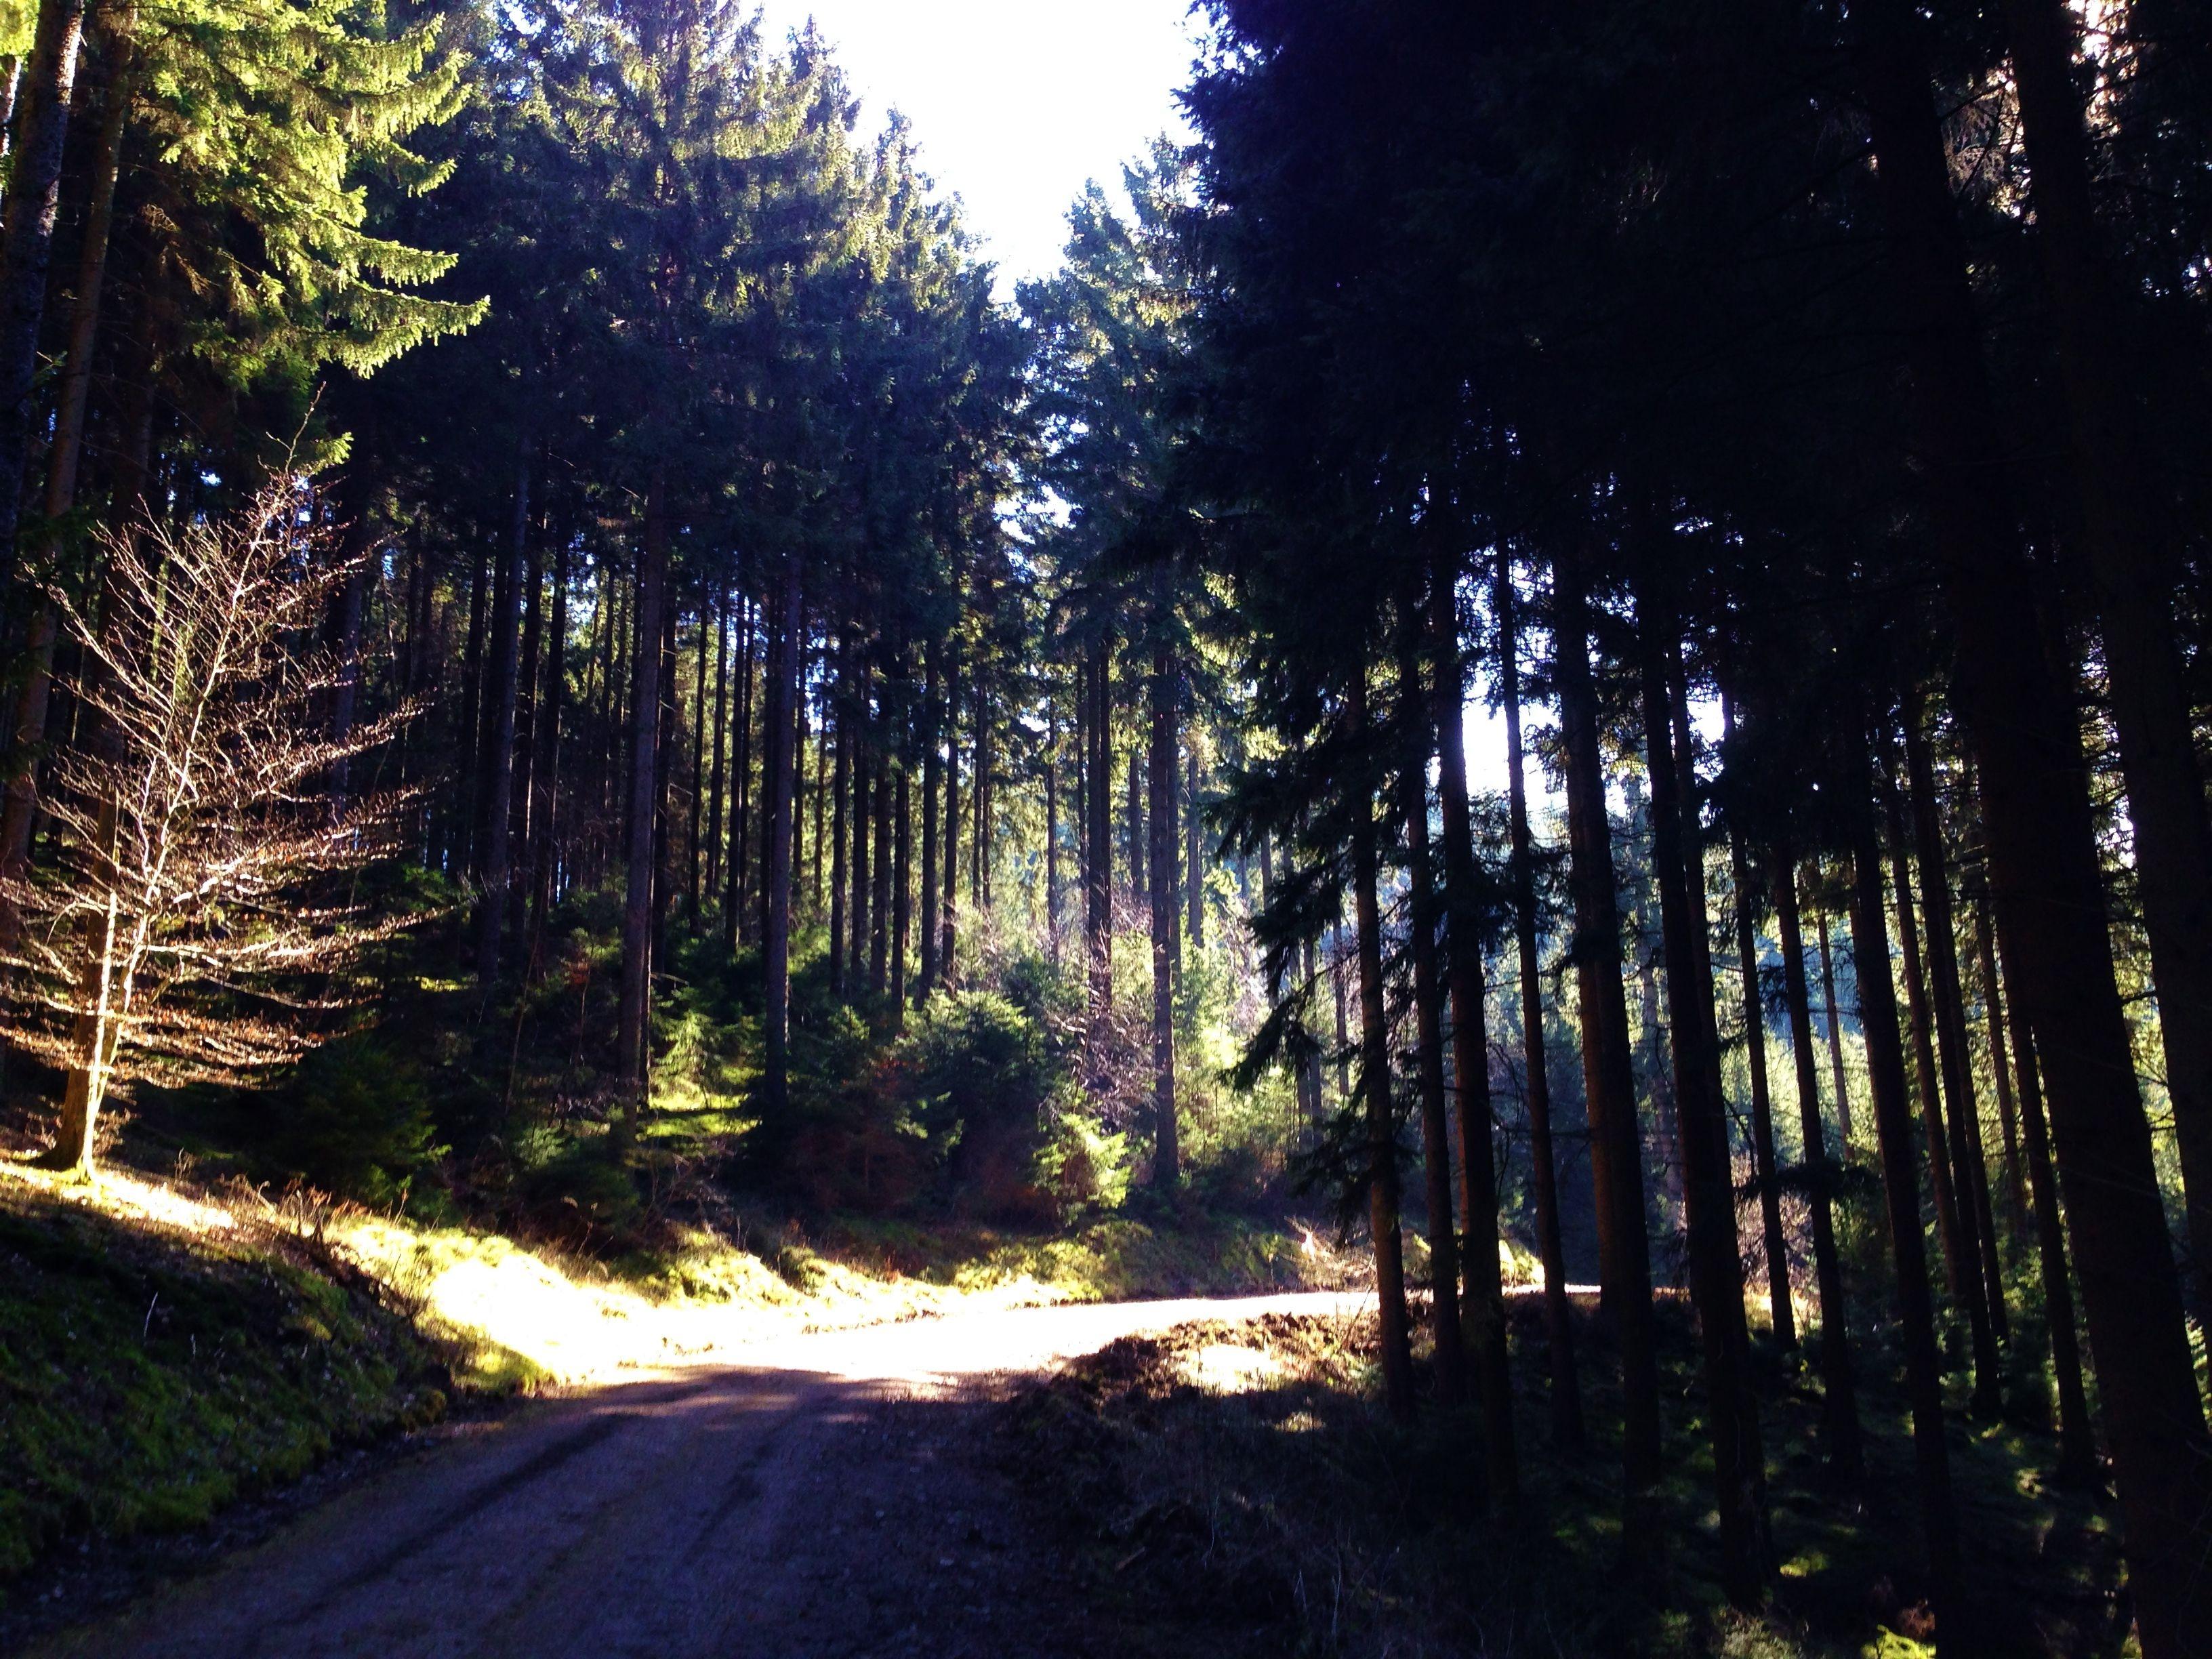 Vetaretus-6 | Sauerland, Germany - Camping, Hiking and more! ·